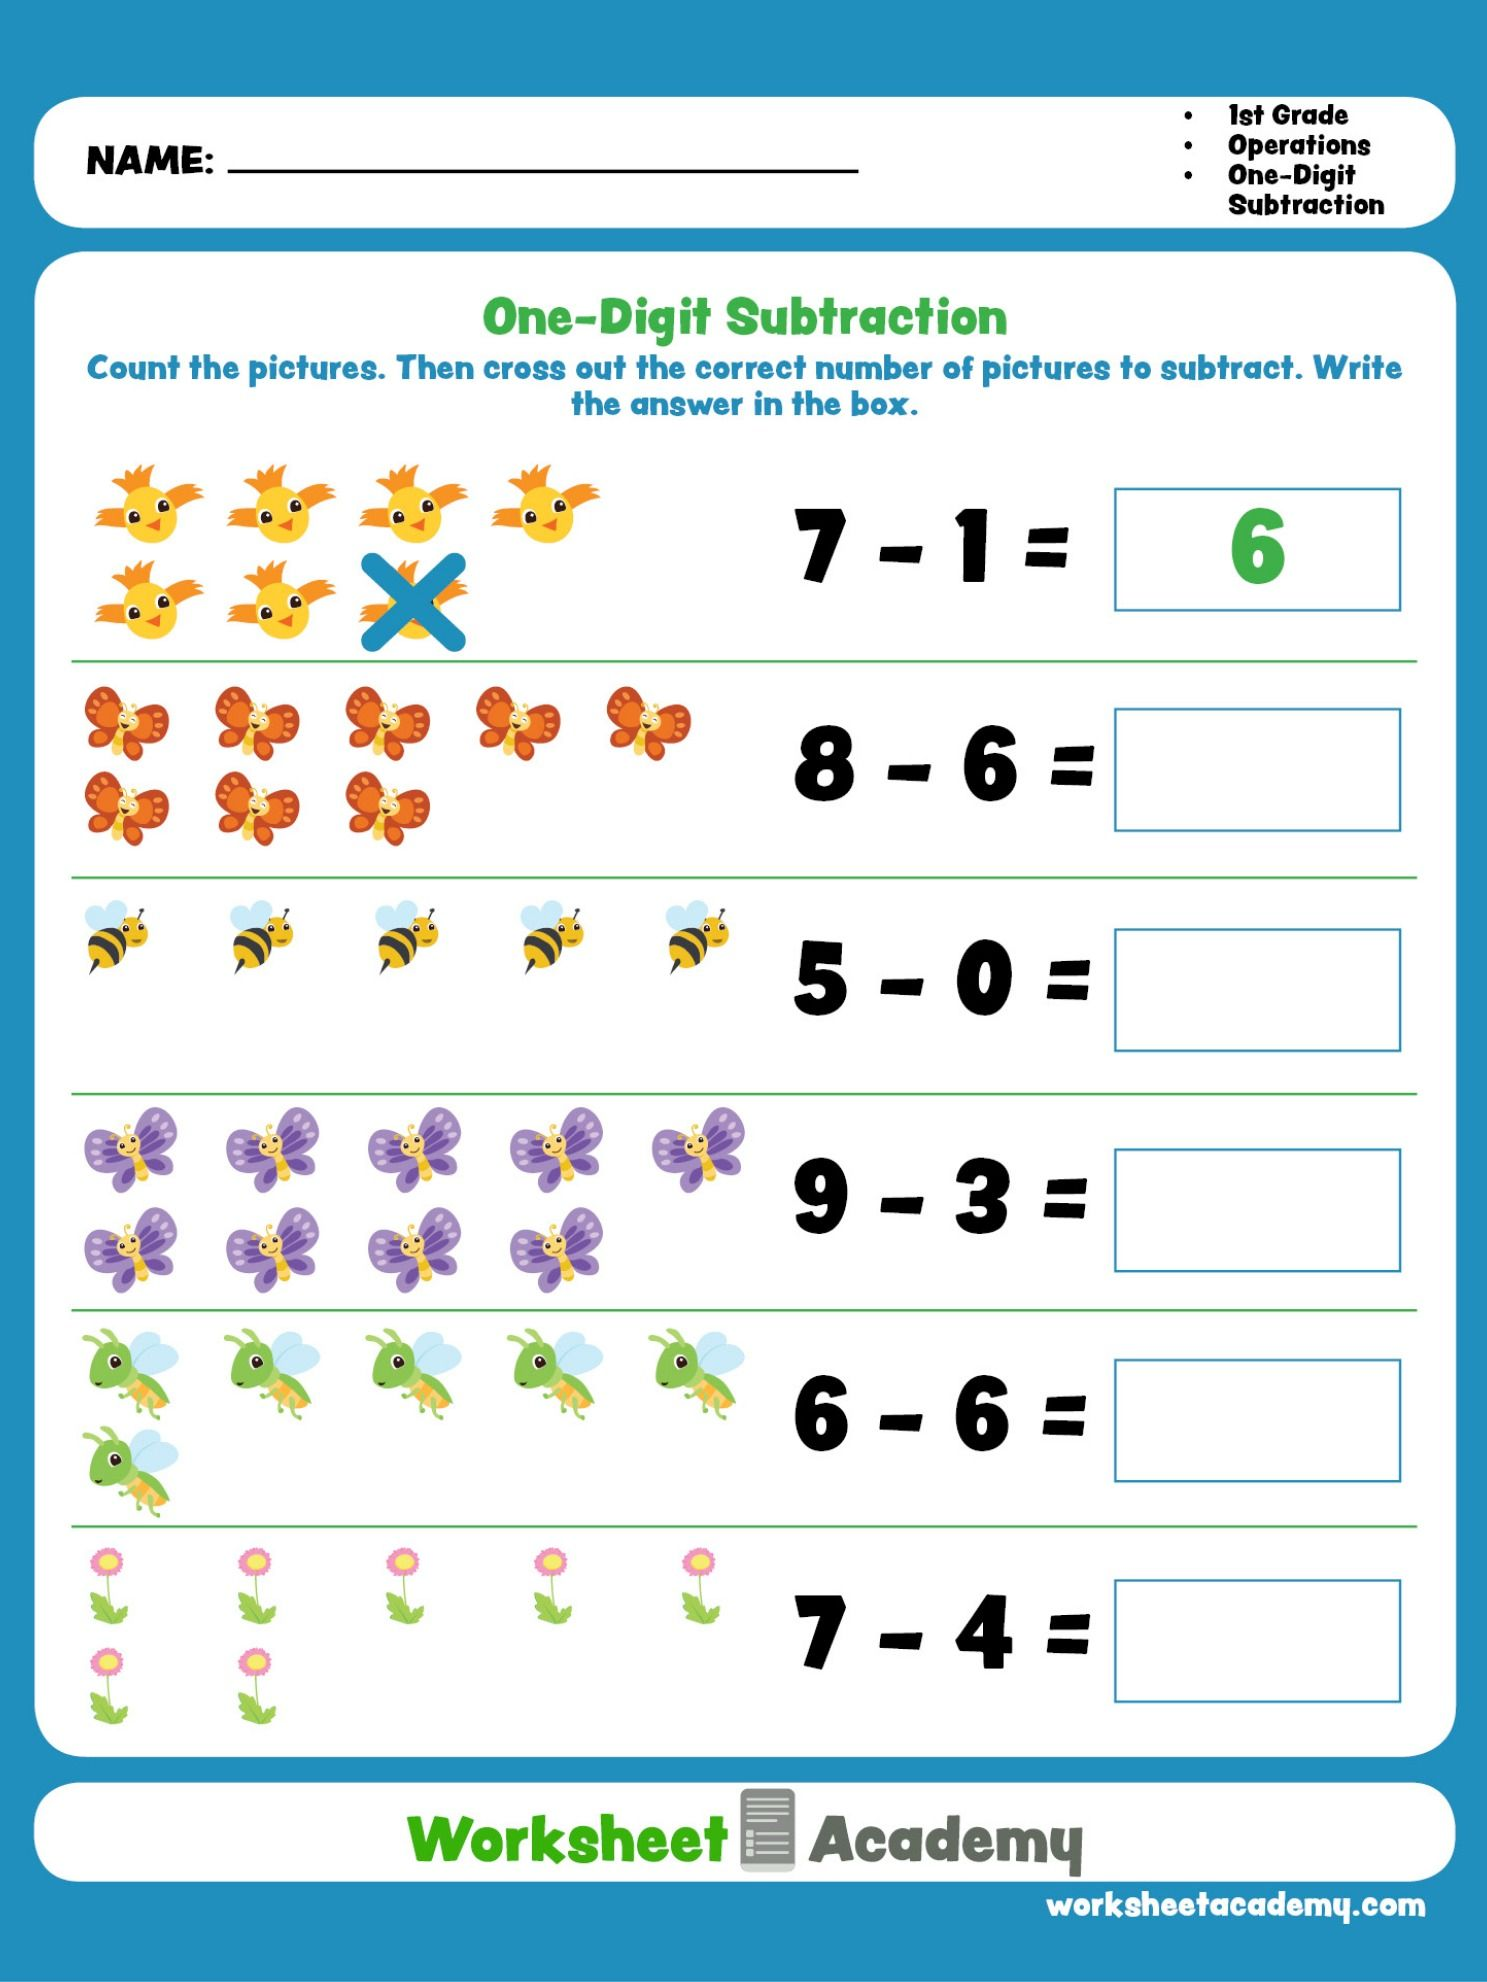 Help Your Student Master Beginning Subtraction